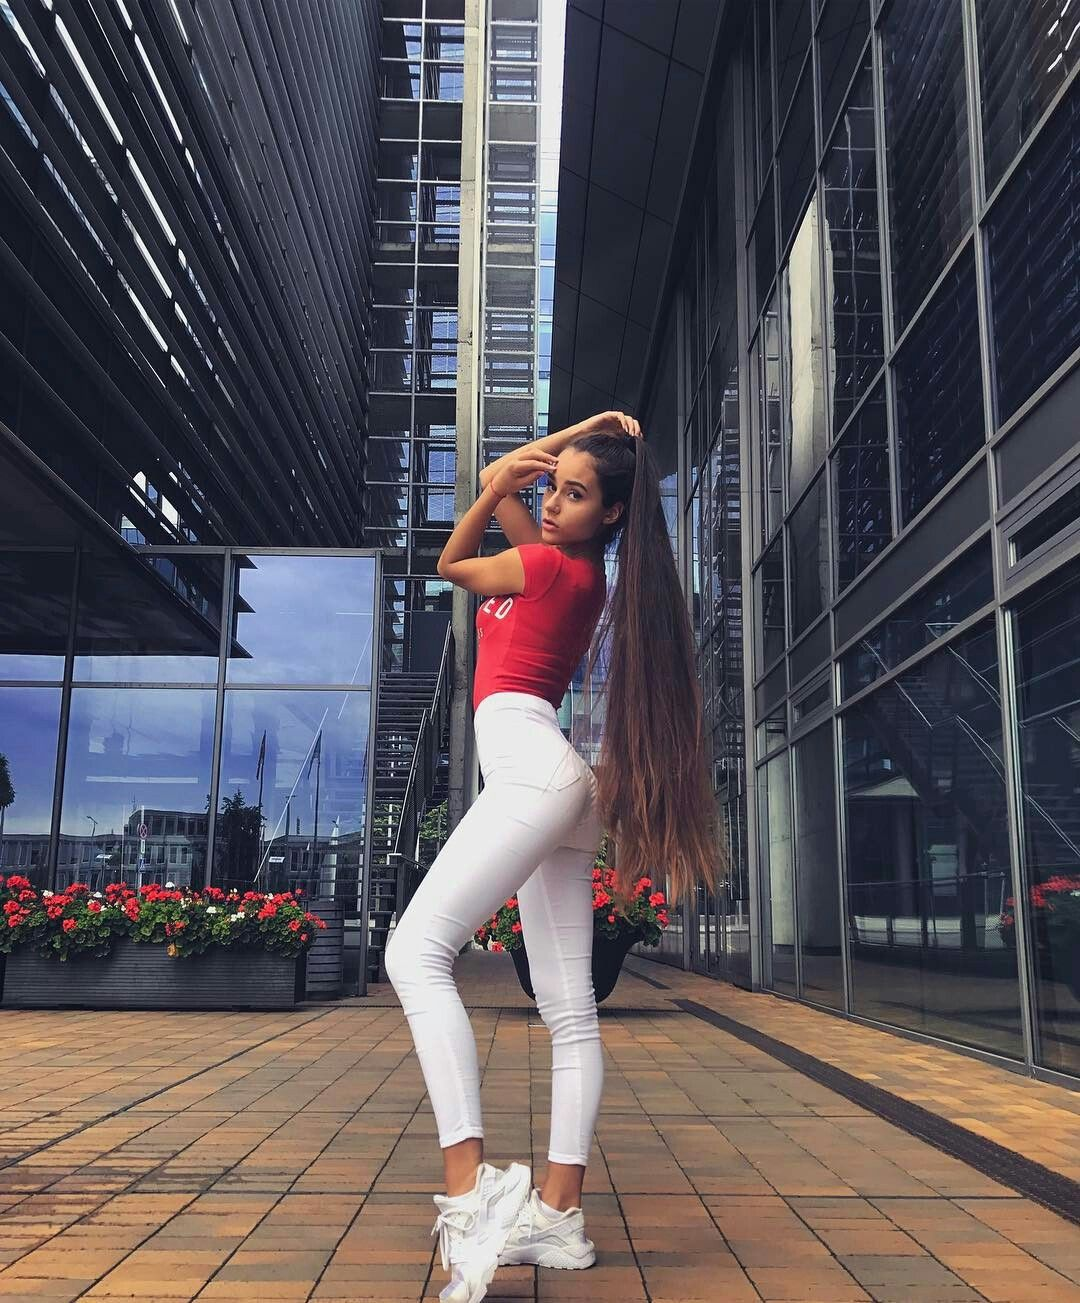 Pin by Стоян Р on Rapunzel in 2020 | Long hair tumblr ...